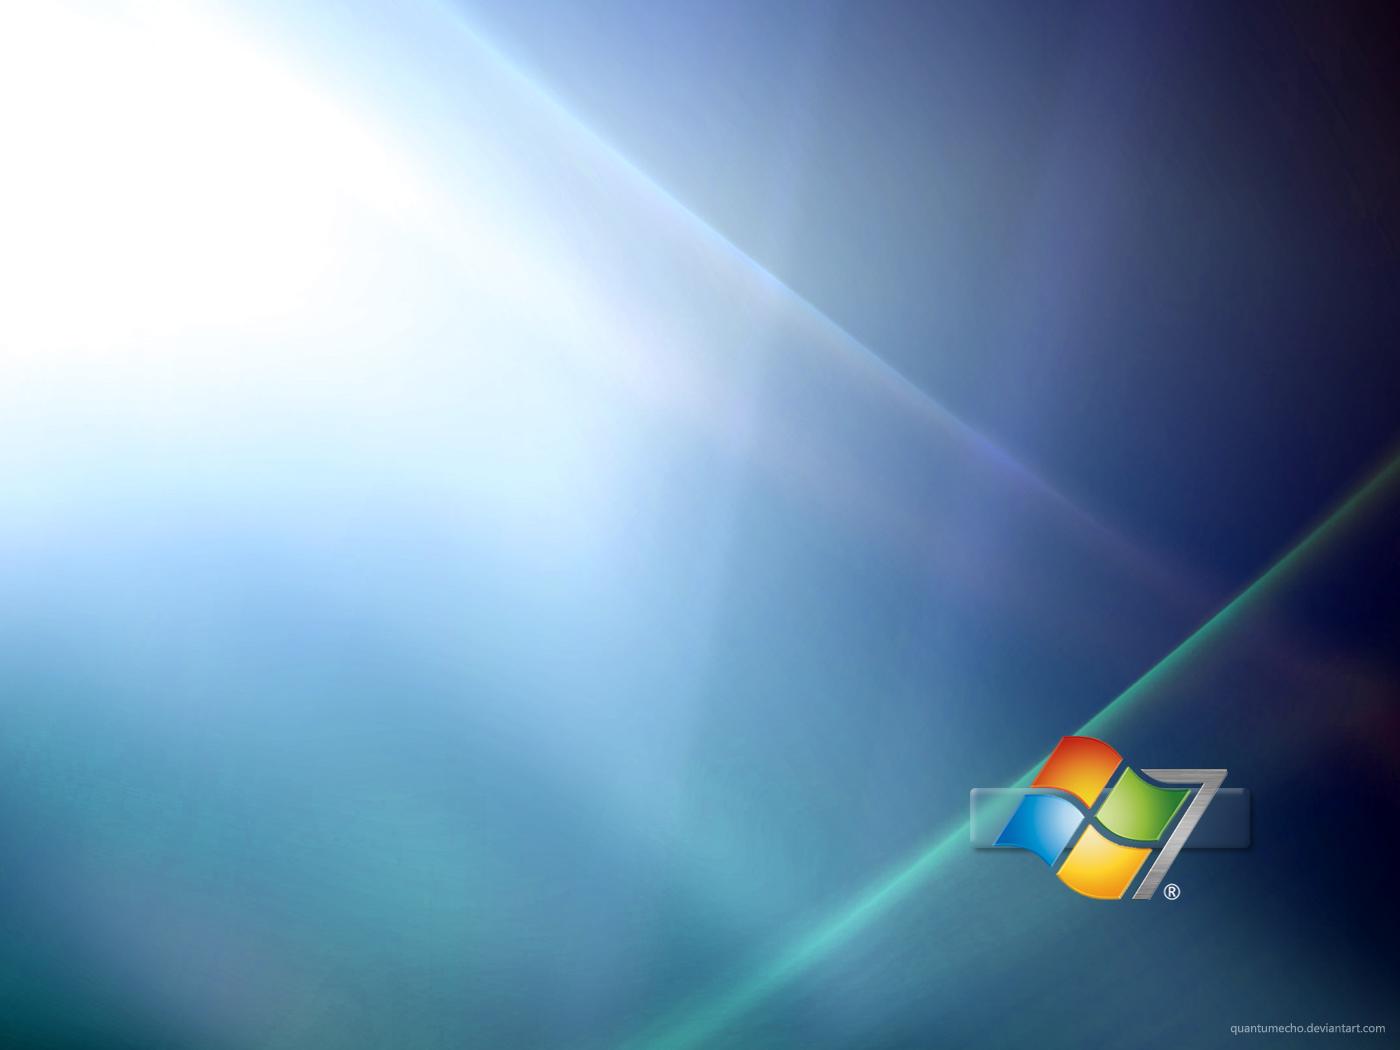 http://1.bp.blogspot.com/-sK68LZDjkkk/TkekJYHUkkI/AAAAAAAADN0/80u-RWhwt0k/s1600/cool-windows-7-wallpaper.jpg